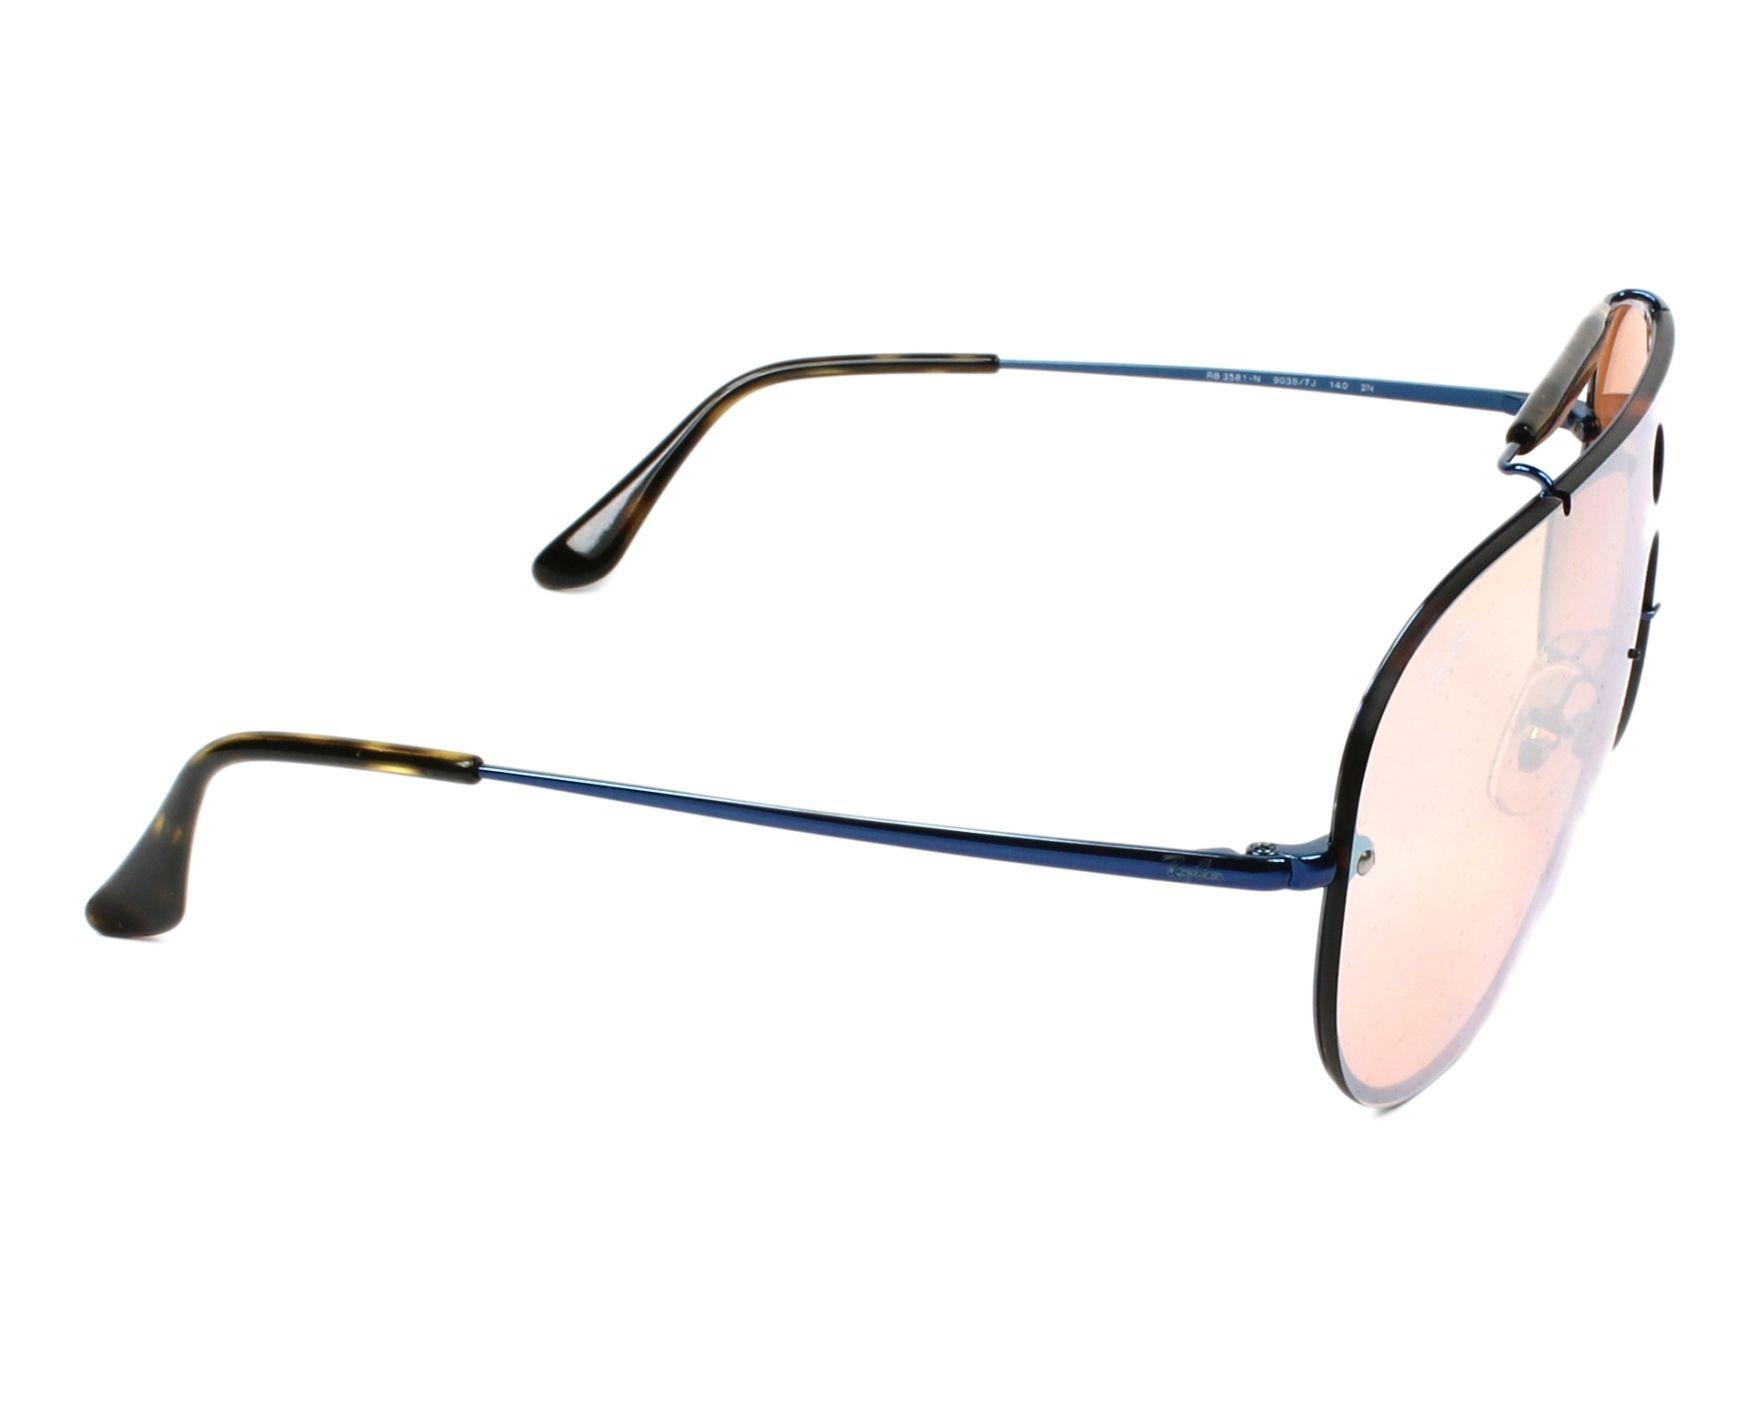 70d2598616f thumbnail Sunglasses Ray-Ban RB-3581-N 90387J - Blue Havana side view